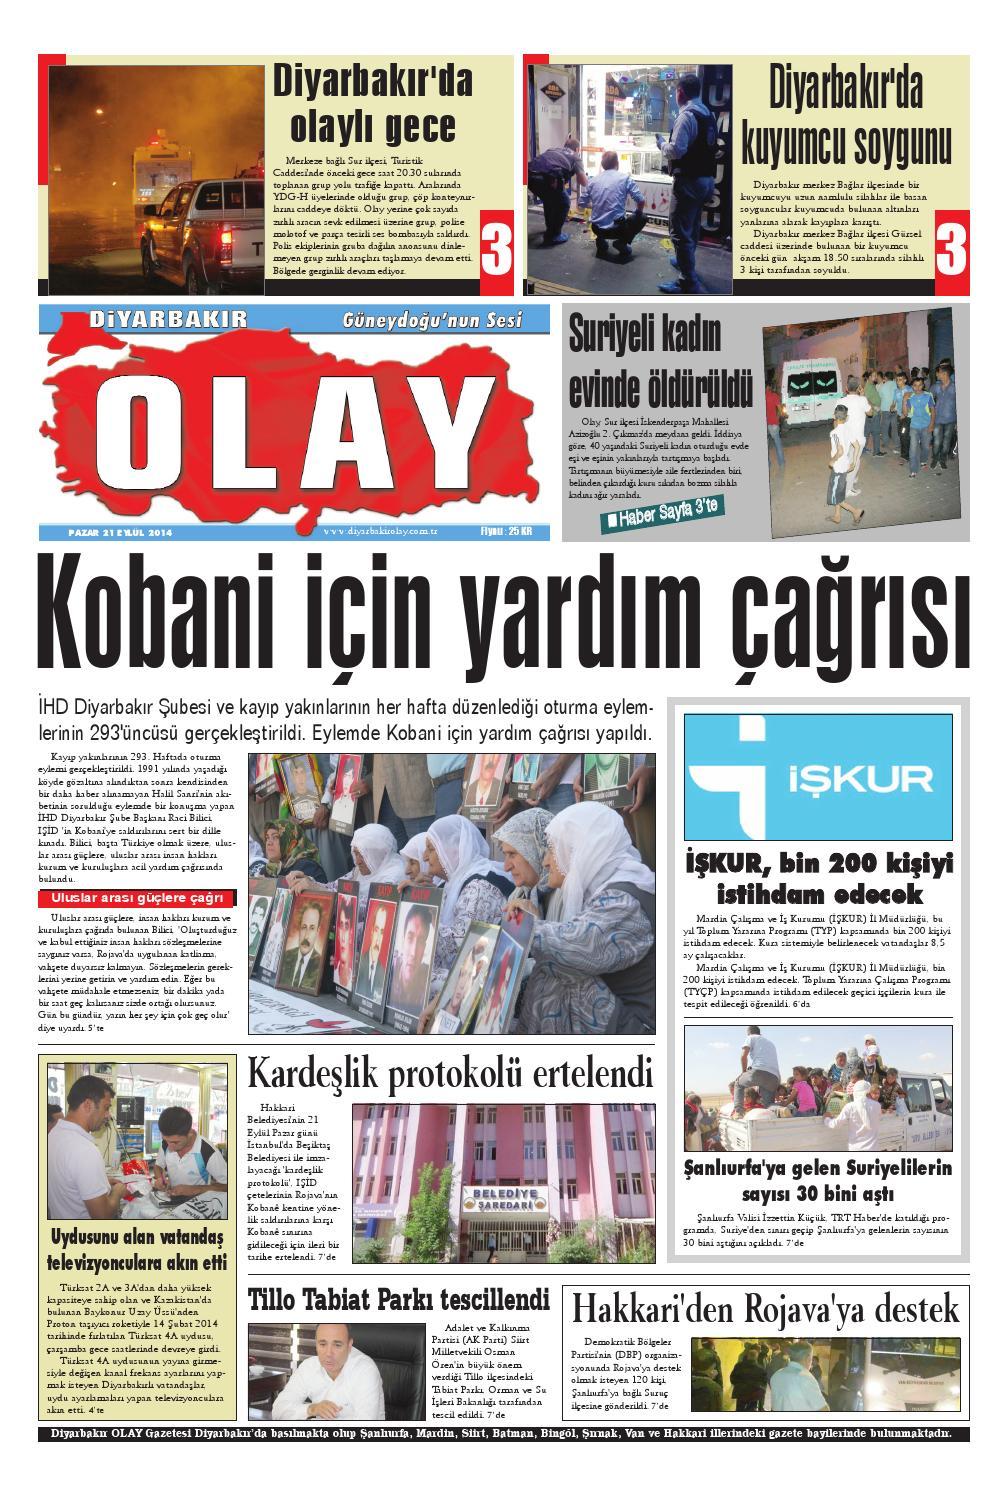 21 09 2014 Gazete Sayfalari By Diyarbakir Olaygazetesi Issuu